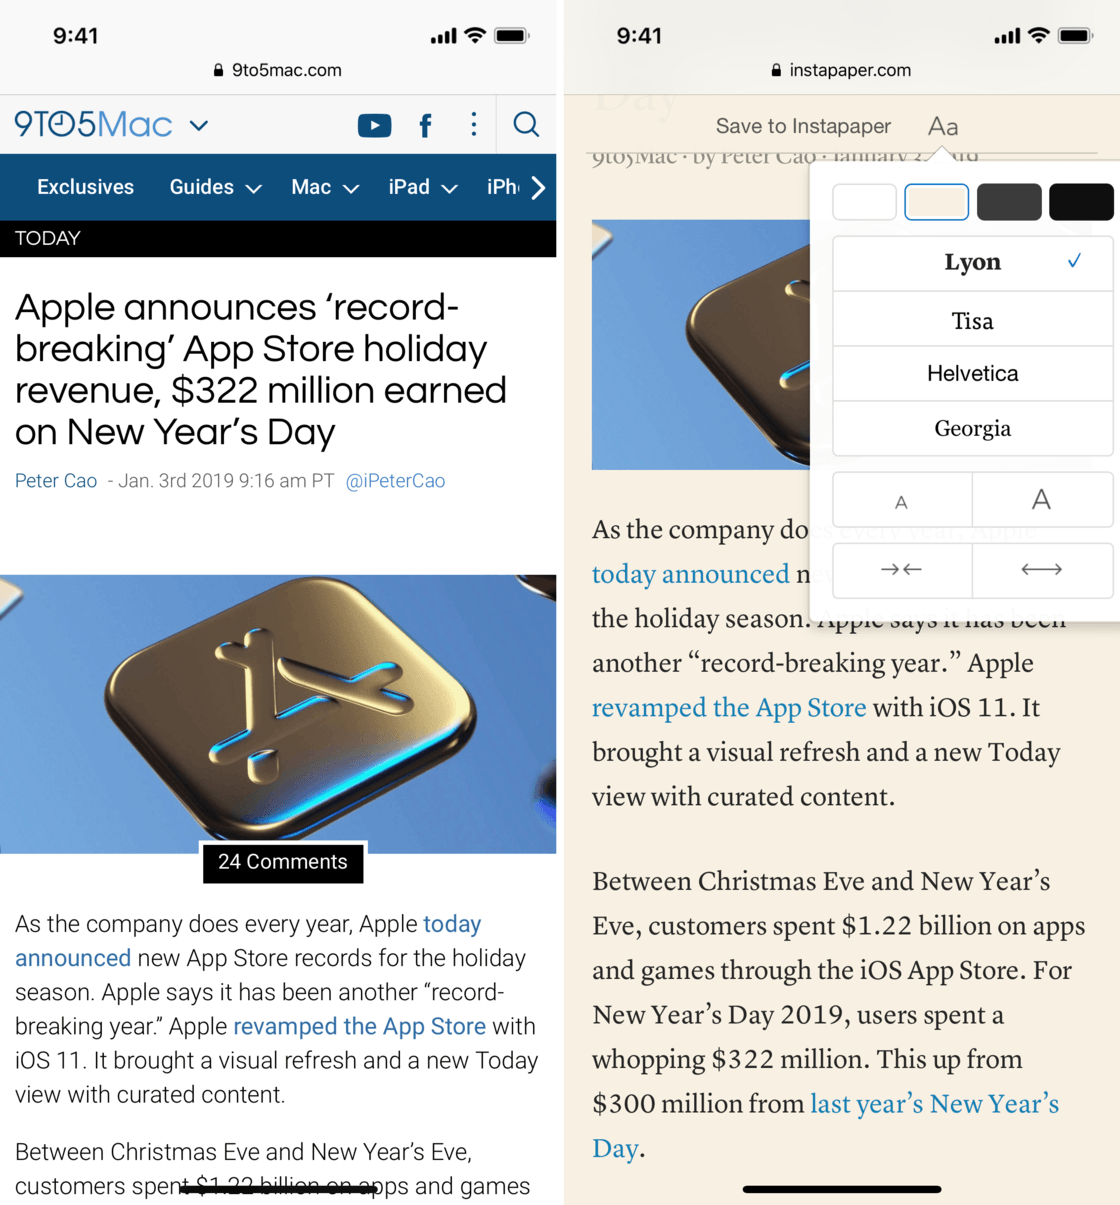 iPhone 实用书签收藏分享 | Safari 浏览器如何高亮关键词?